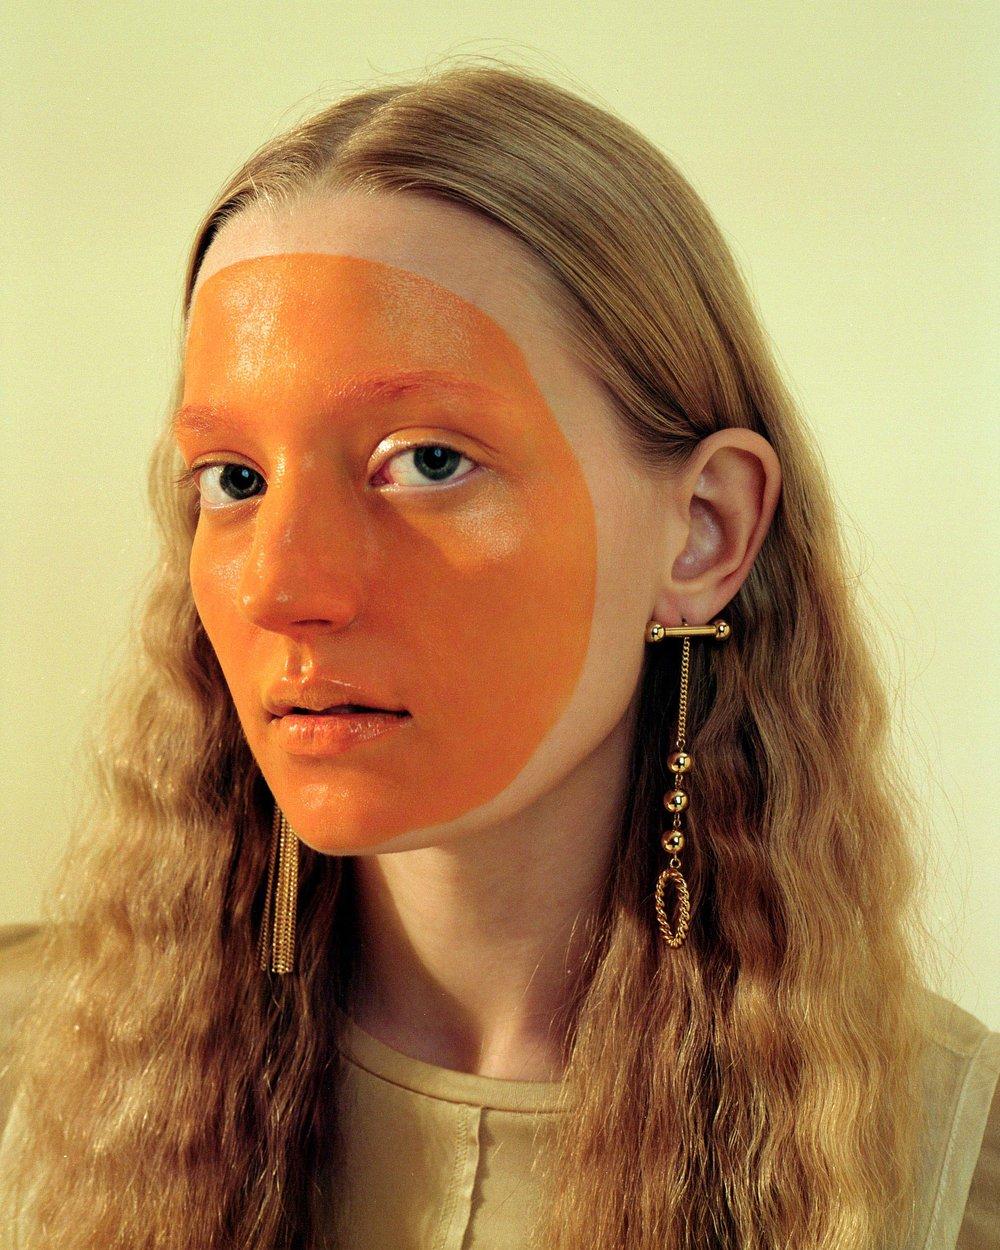 Photography by  Nina Raasch  Fashion by  Ricarda Venjacob  Hair and Makeup  Katja Maassen  Model  Marie Louwes